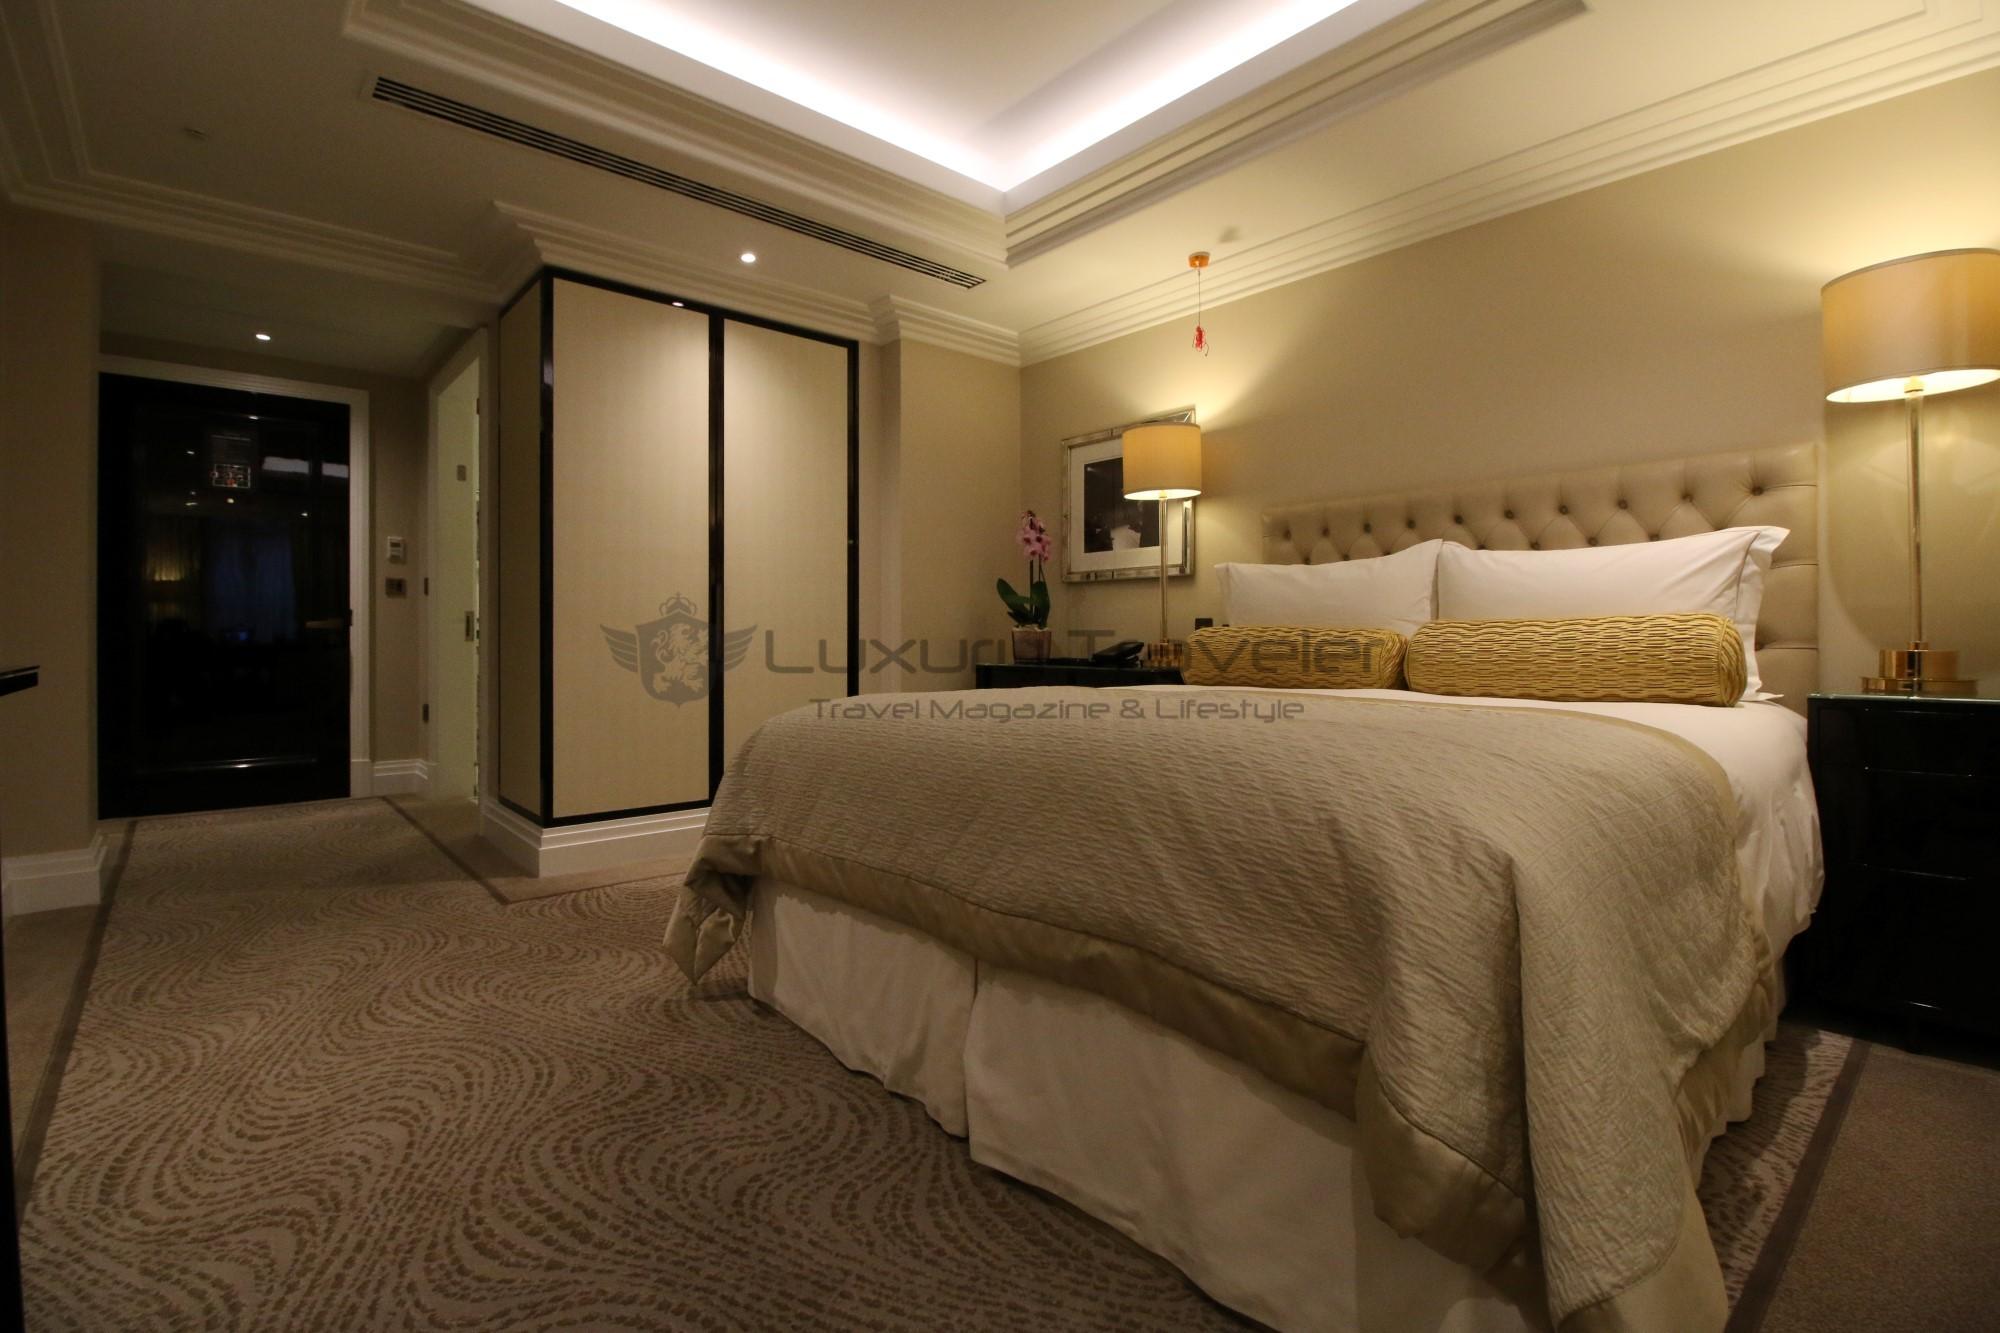 19-luxury_hotel_london_the_wellesley